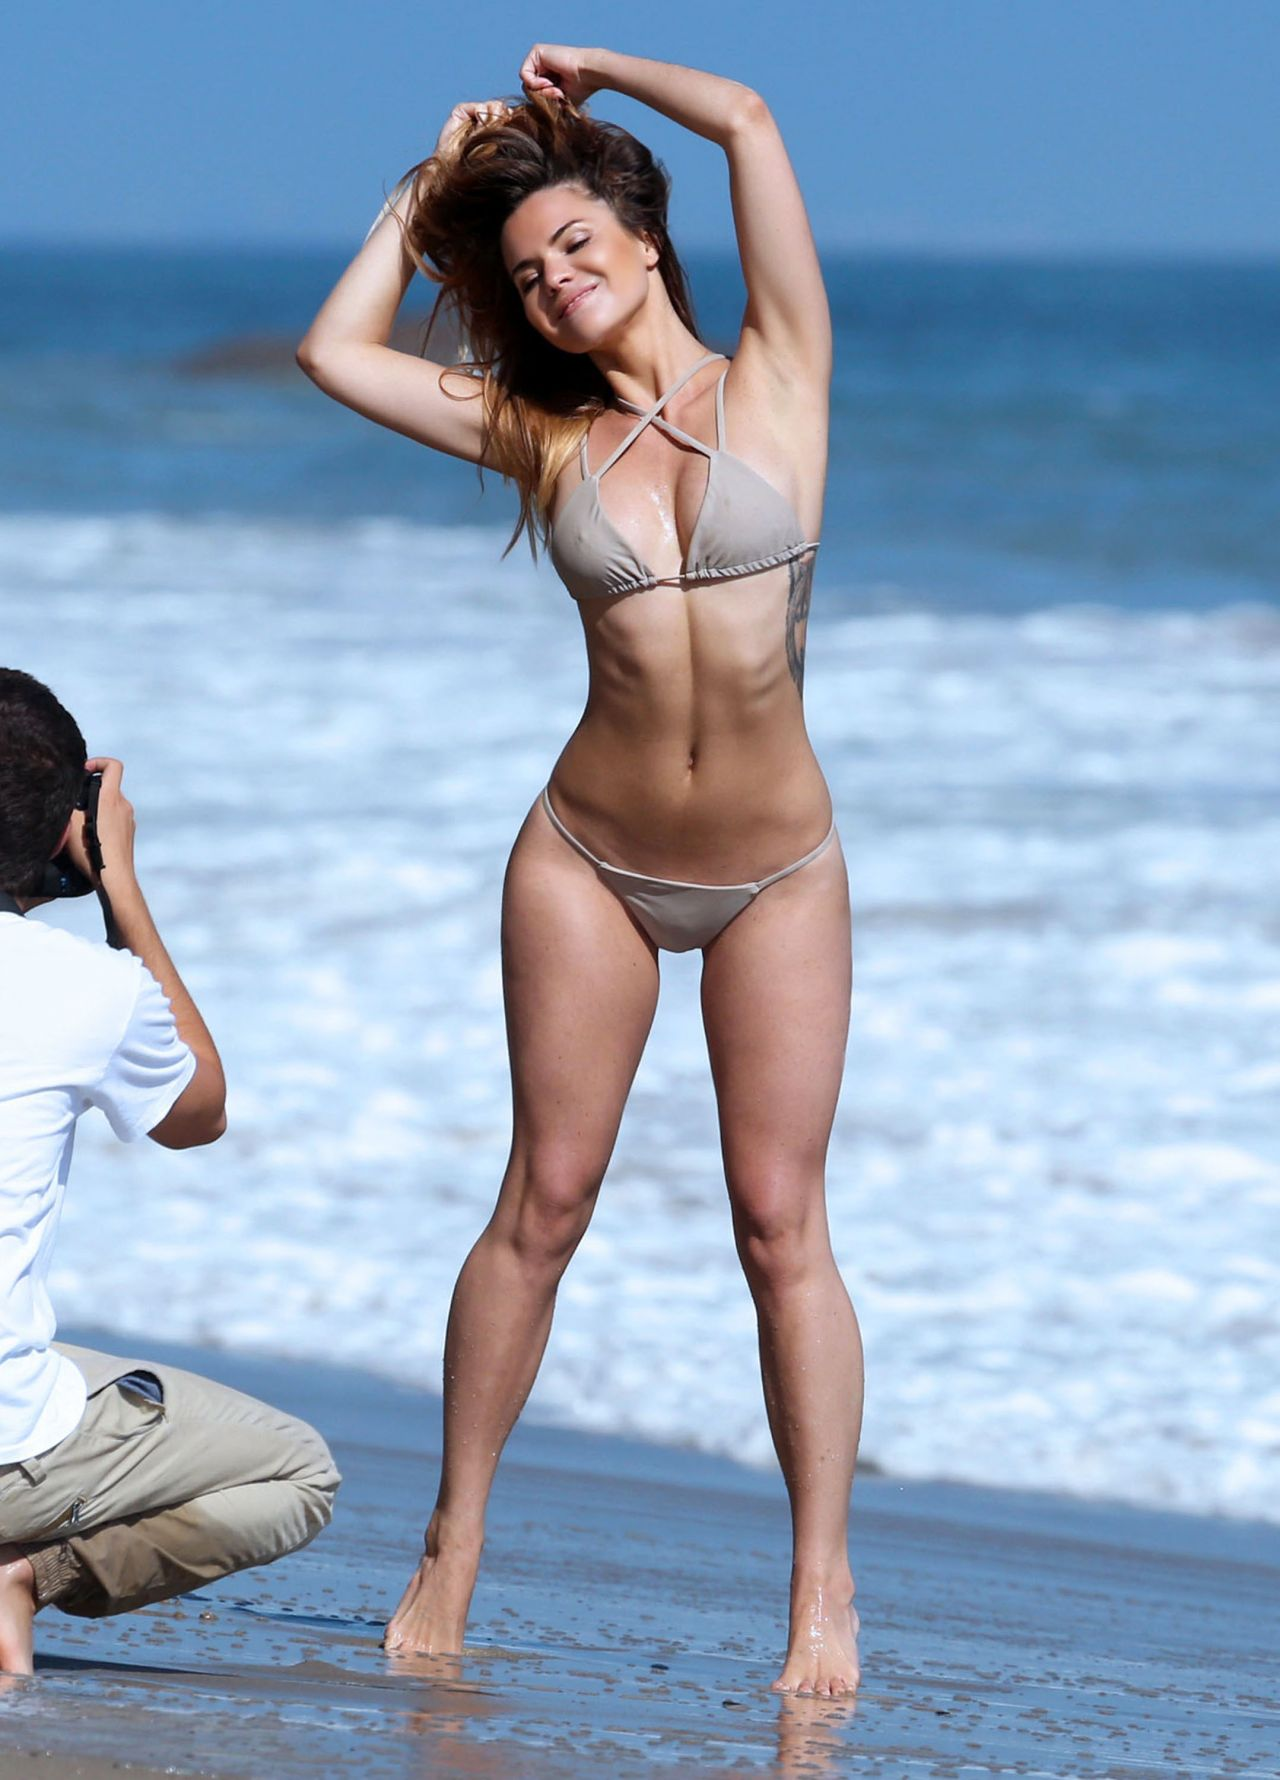 Bikini Kaili Thorne nudes (79 foto and video), Ass, Sideboobs, Instagram, in bikini 2018